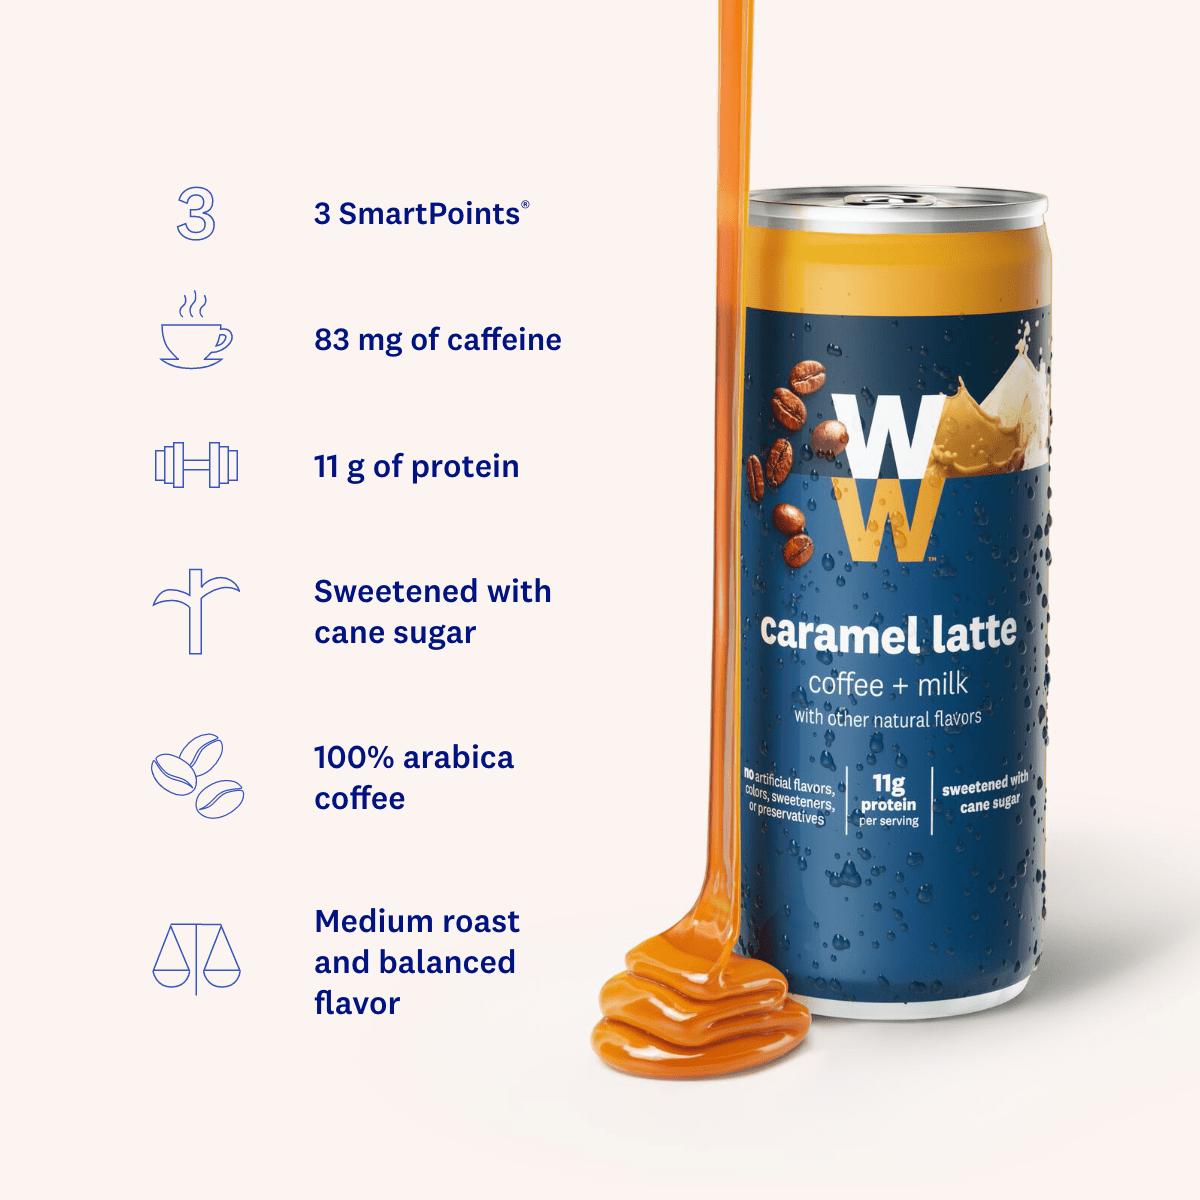 Caramel Latte - infographic